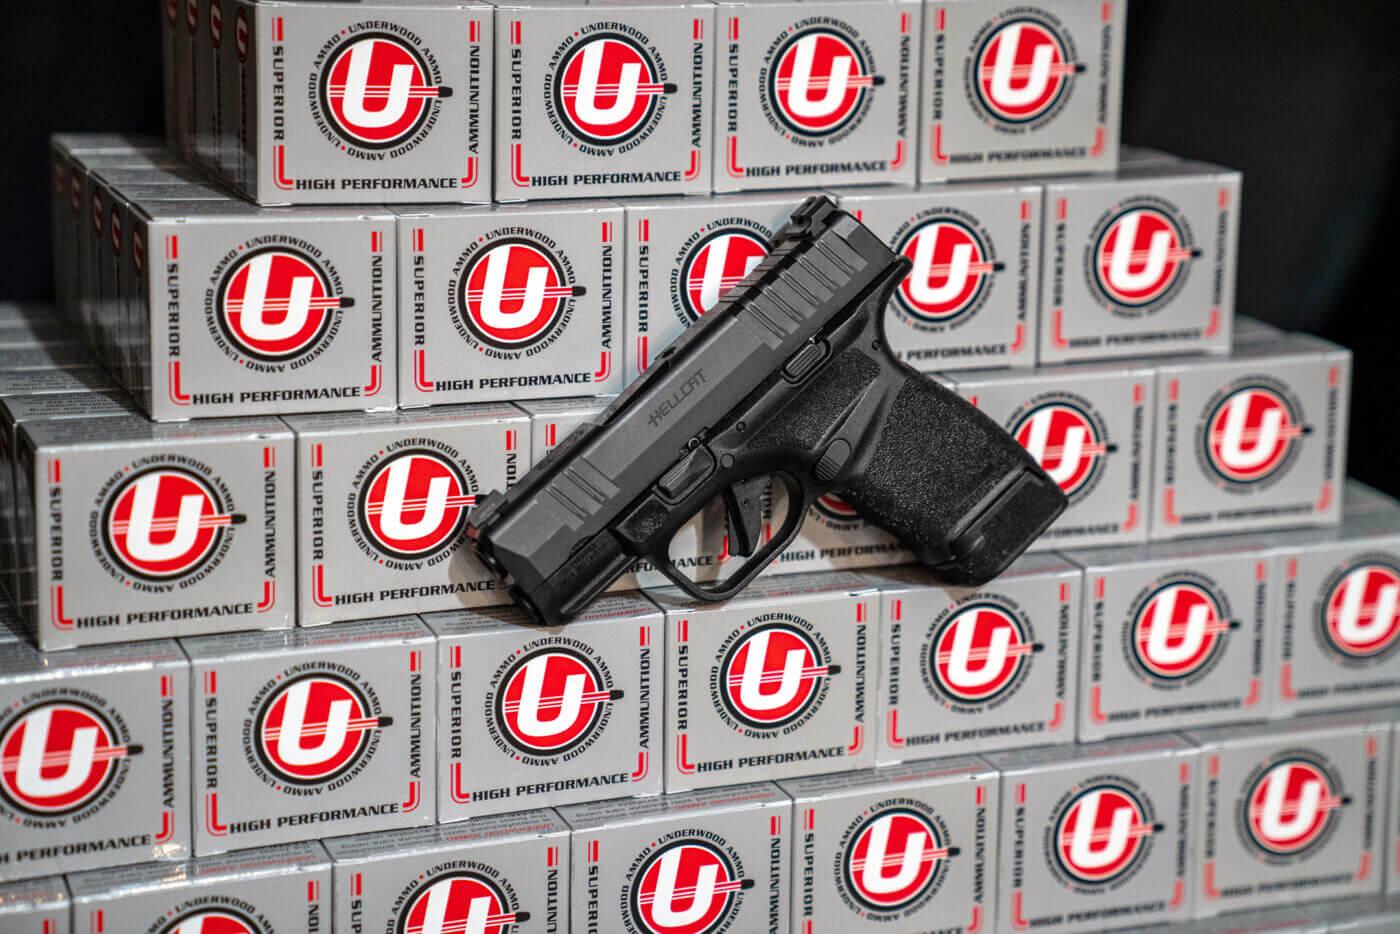 10,000 rounds of Underwood ammo